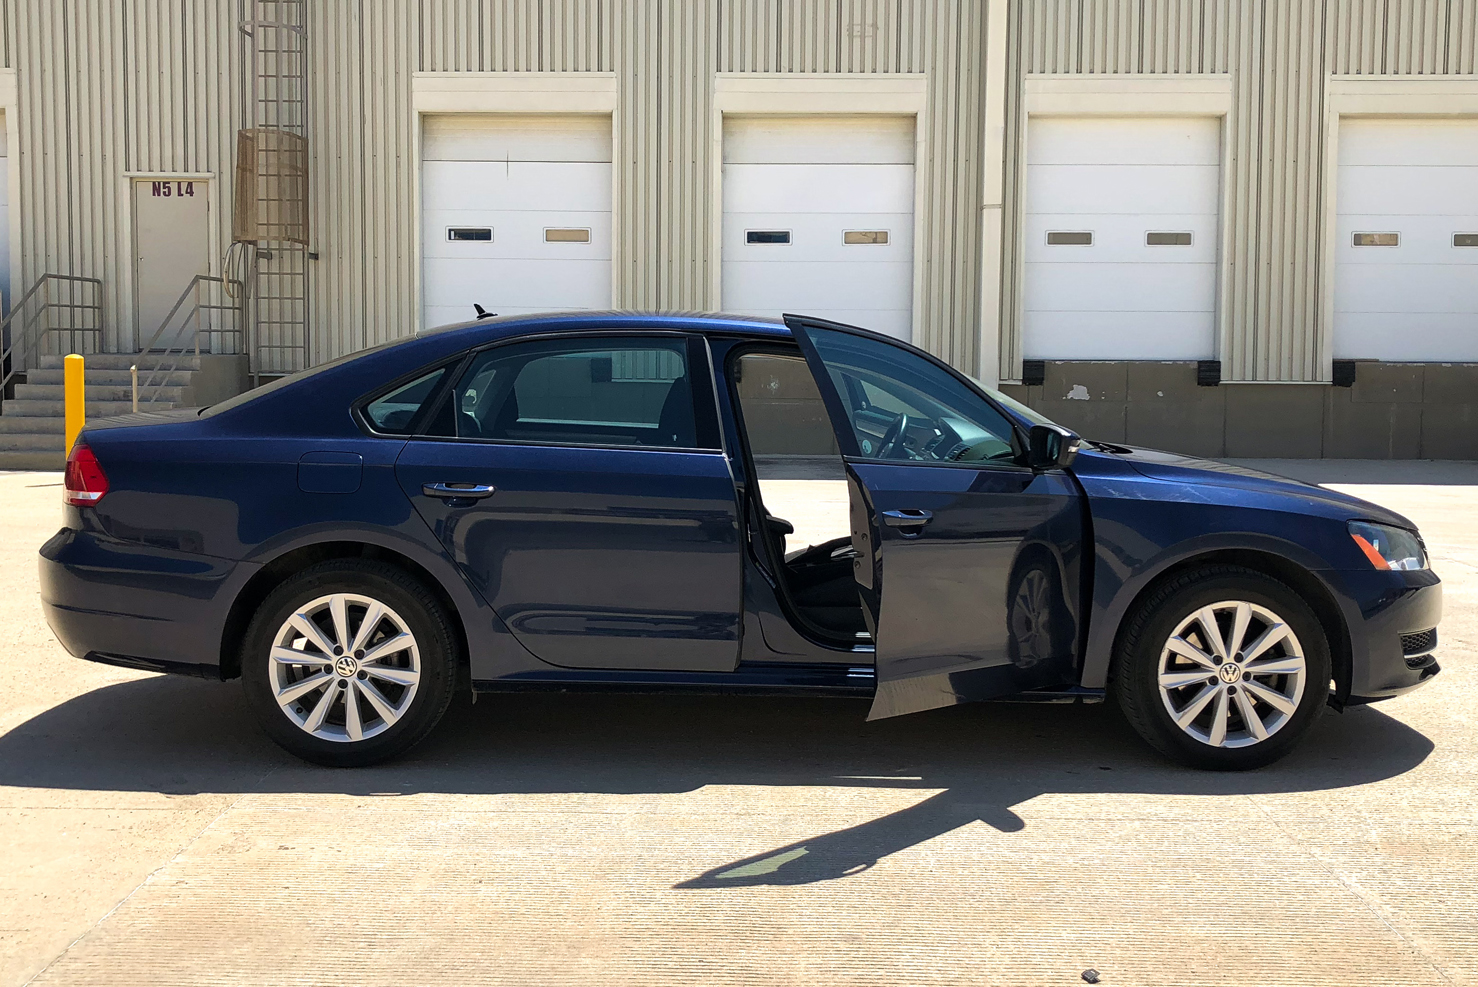 Volkswagen Passat (Sedanes Medianos de Lujo) | BBB Rent a Car